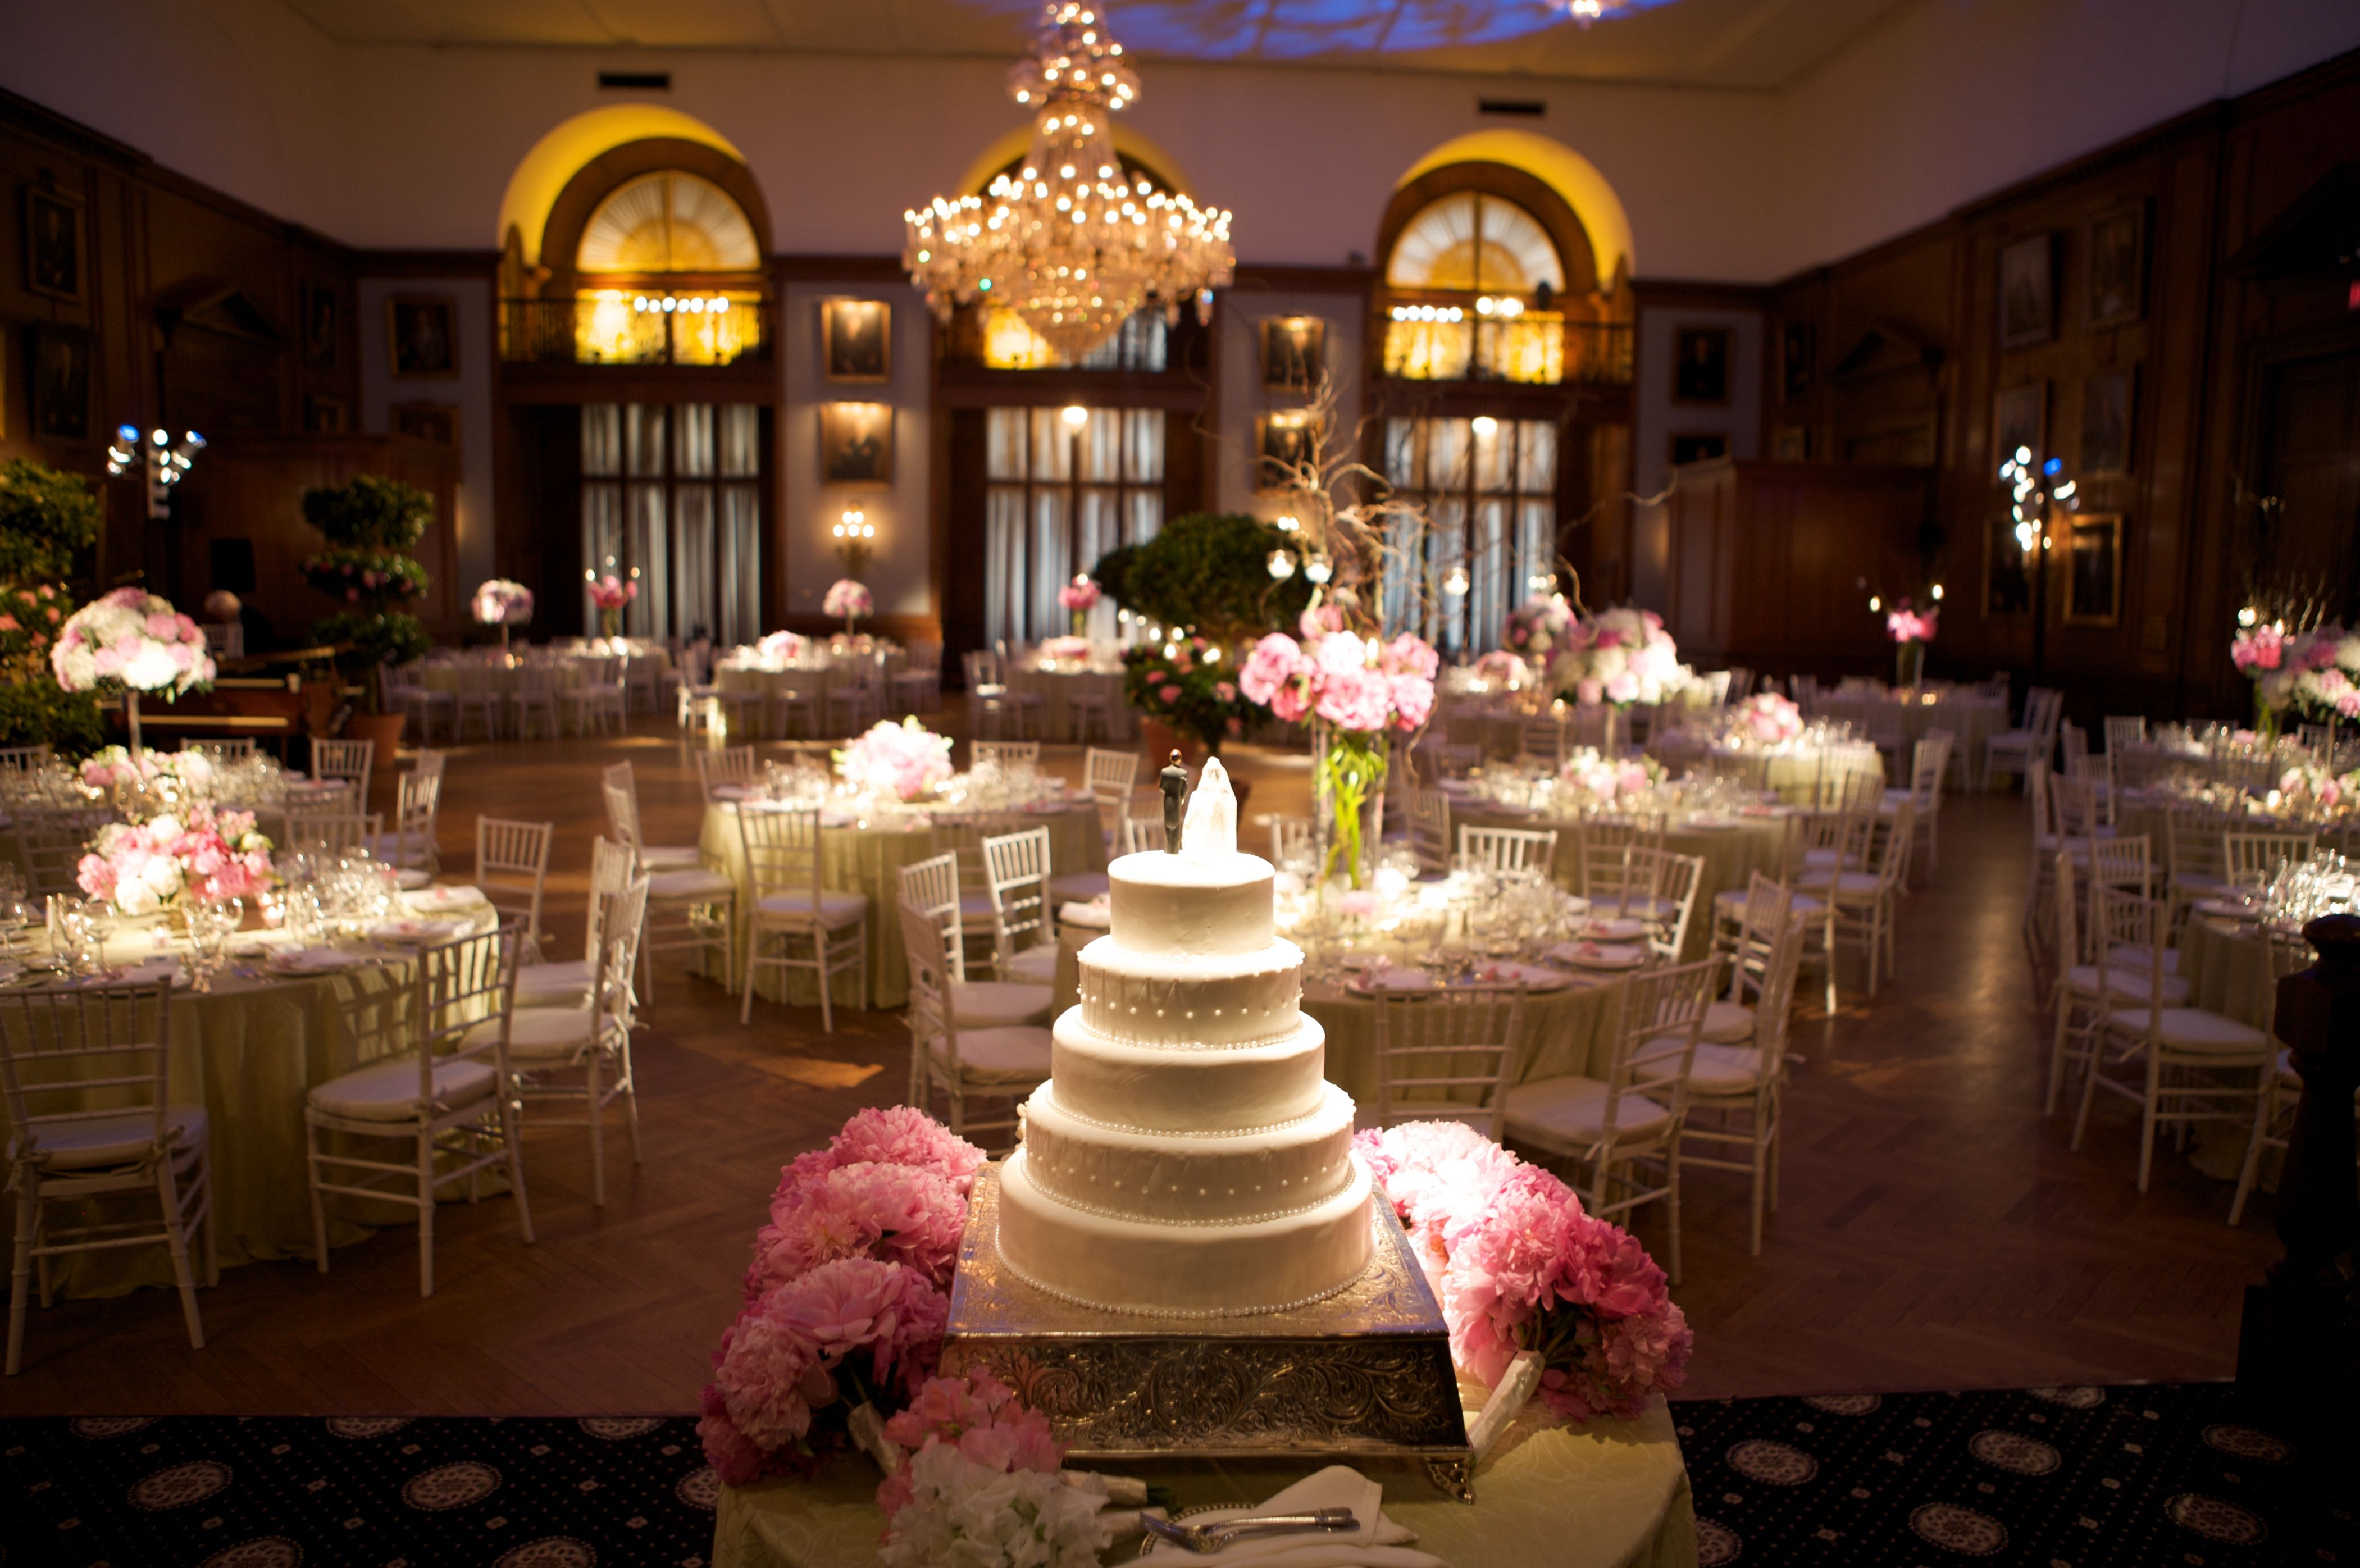 Tableart wedding venue union league of philadelphia sarah tableart wedding venue union league of philadelphia sarah dicicco www junglespirit Gallery